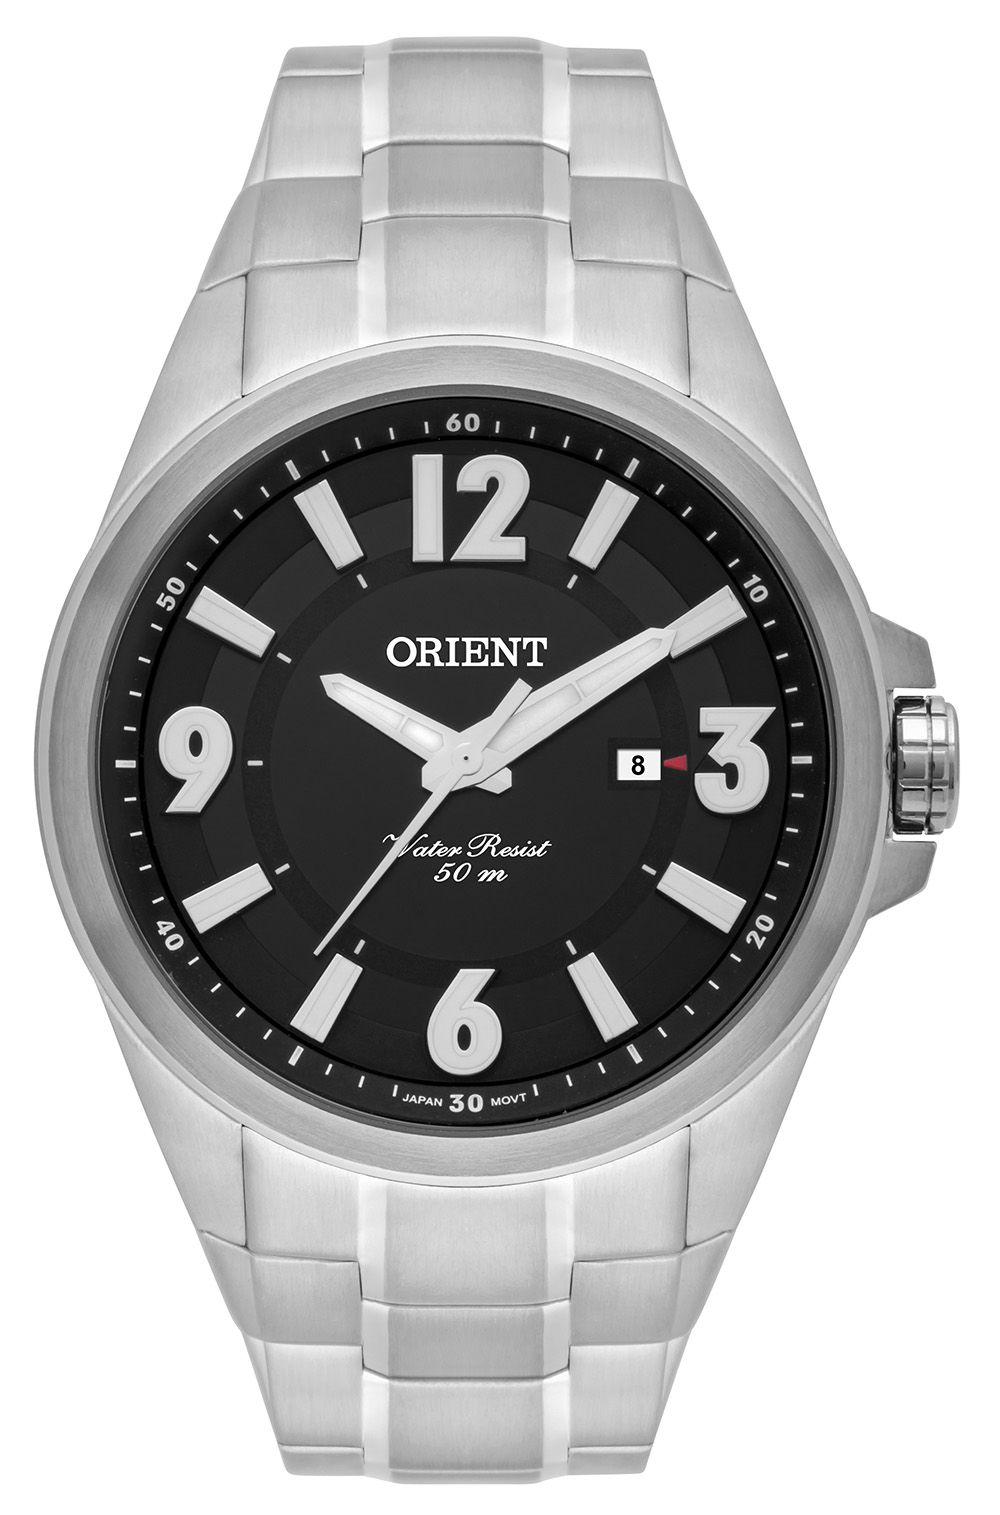 Relógio Masculino Casual Prata MBSS1283-P2SX Orient